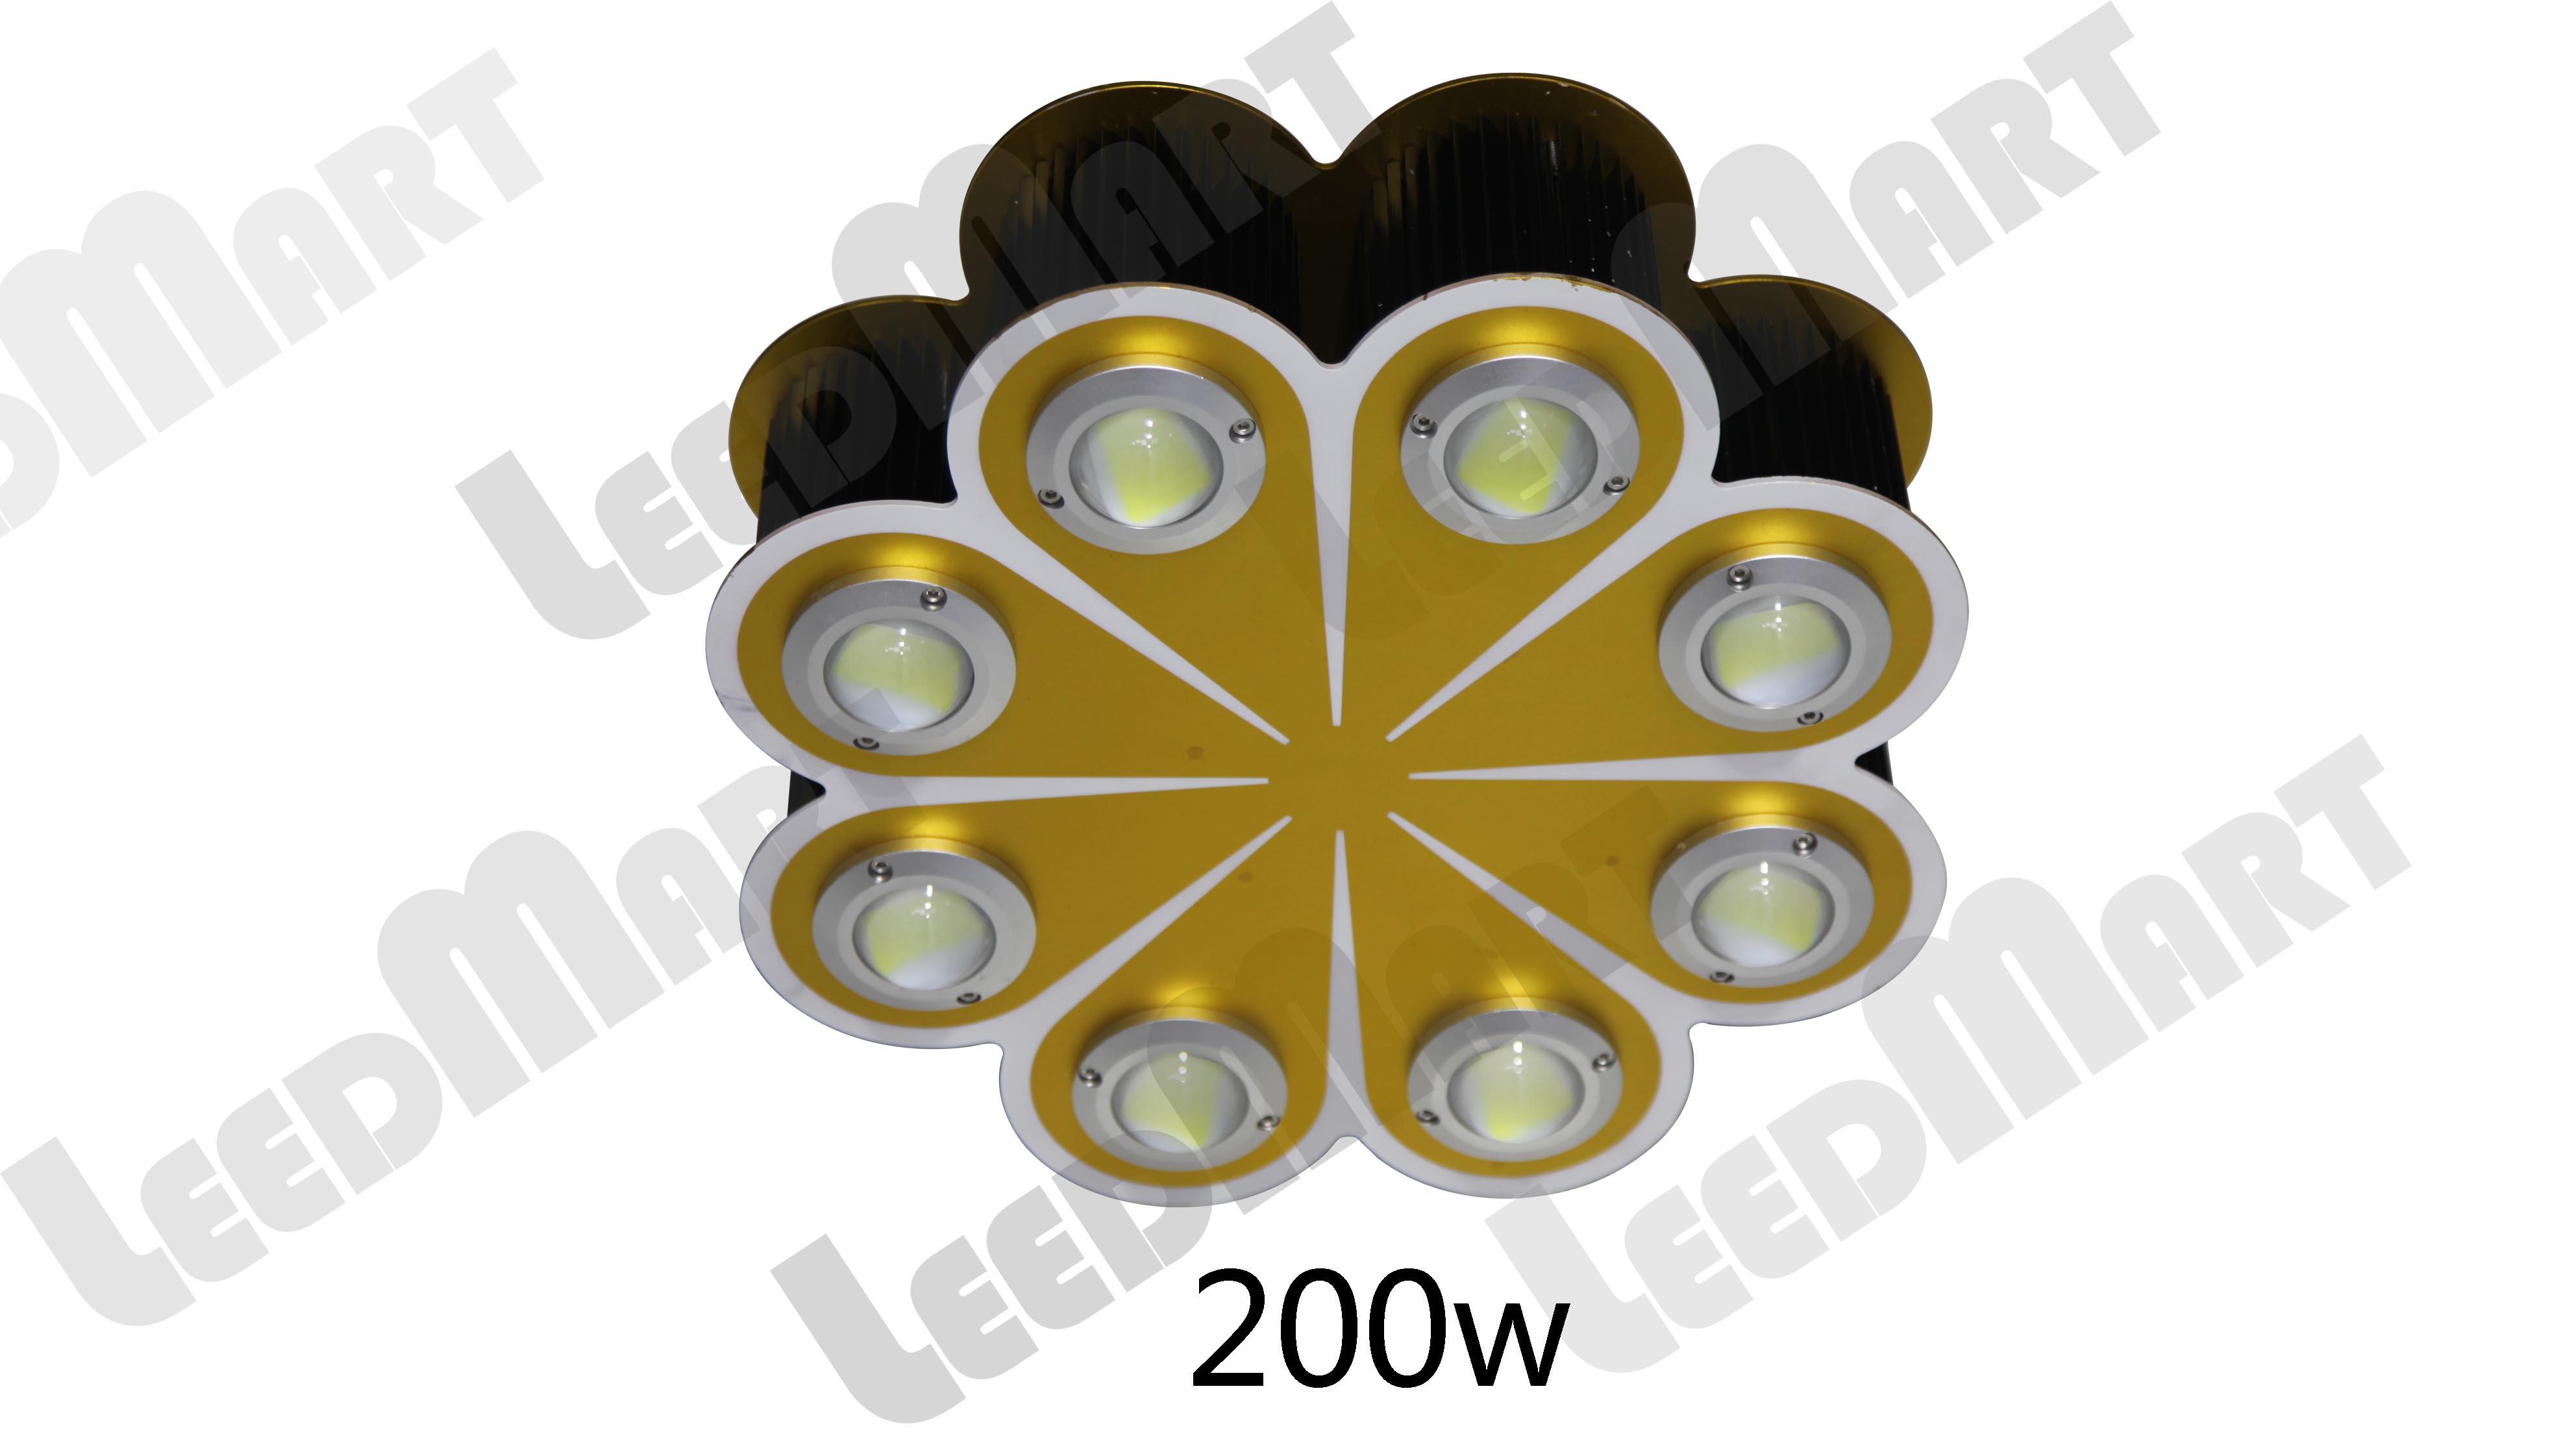 LED high bay light 100w-600w innovative orange artistic design warehouse industrial light fixture